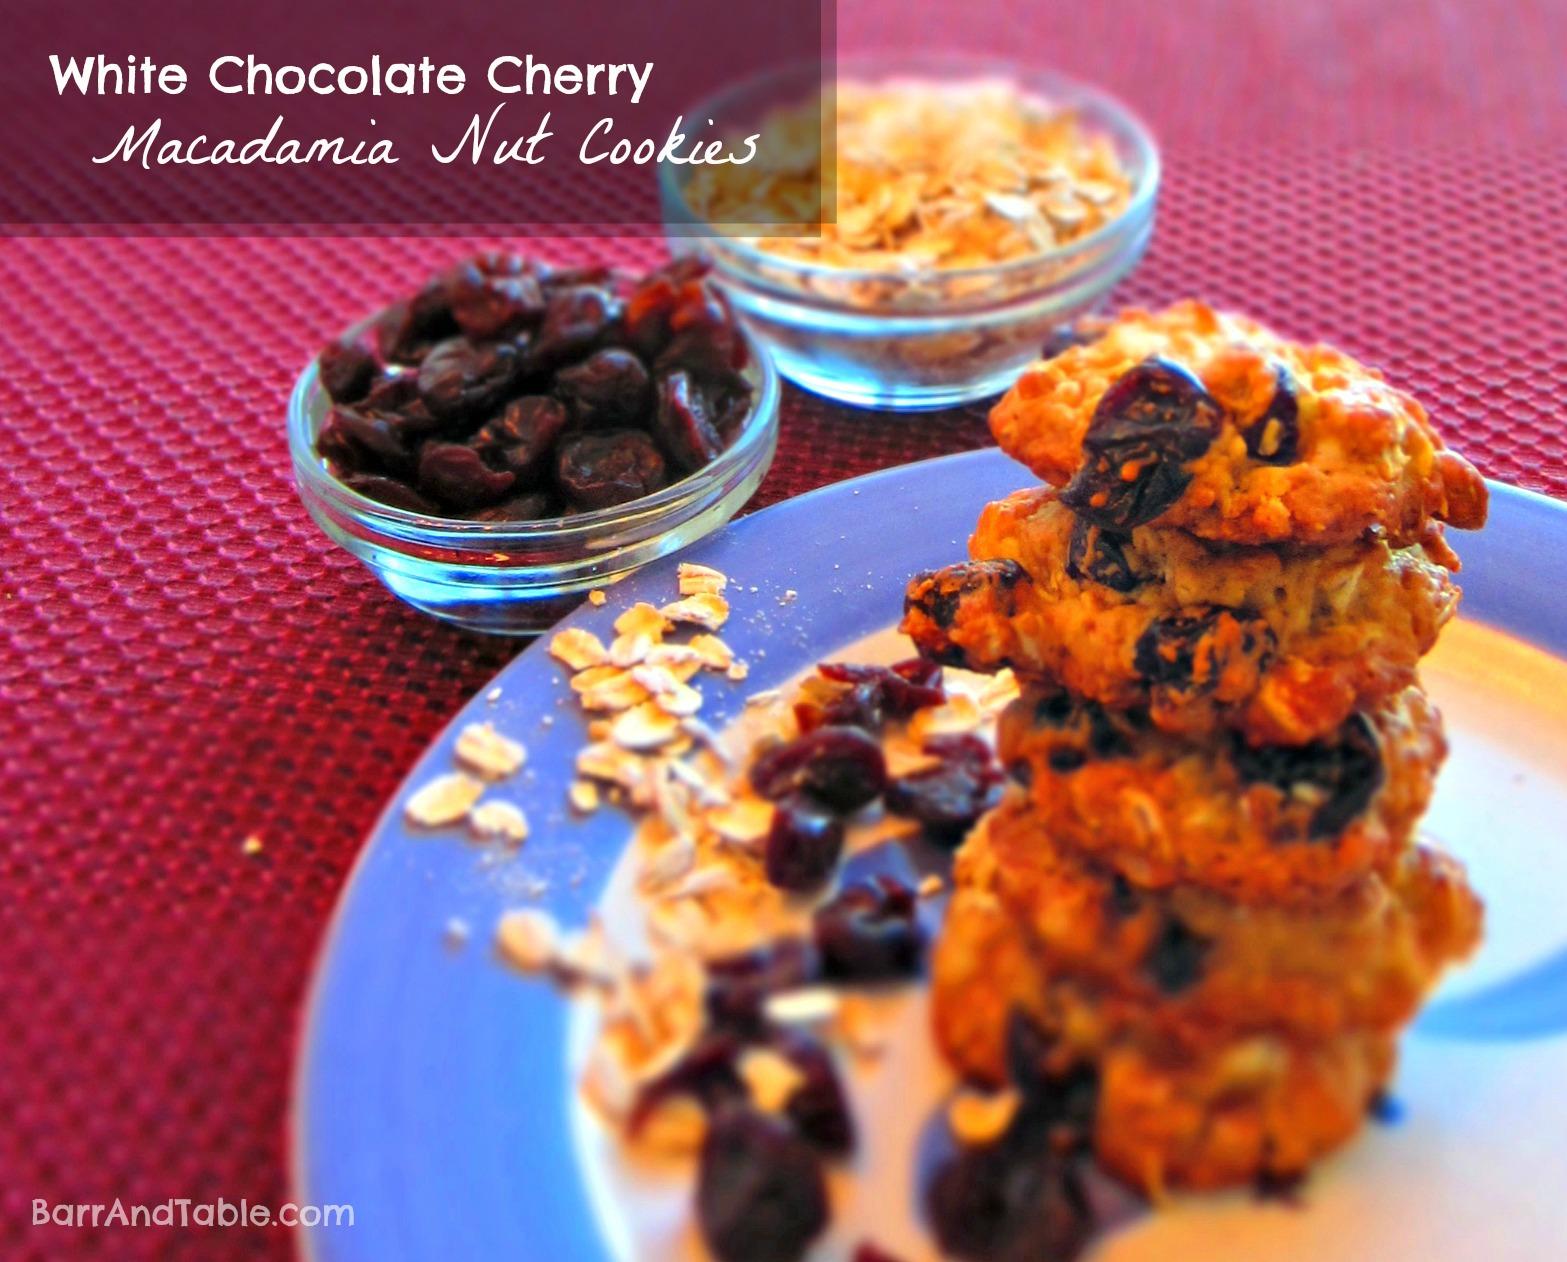 ... Cookies Ghirardelli White Chocolate Chunk Dried Cherry Macadamia Nut